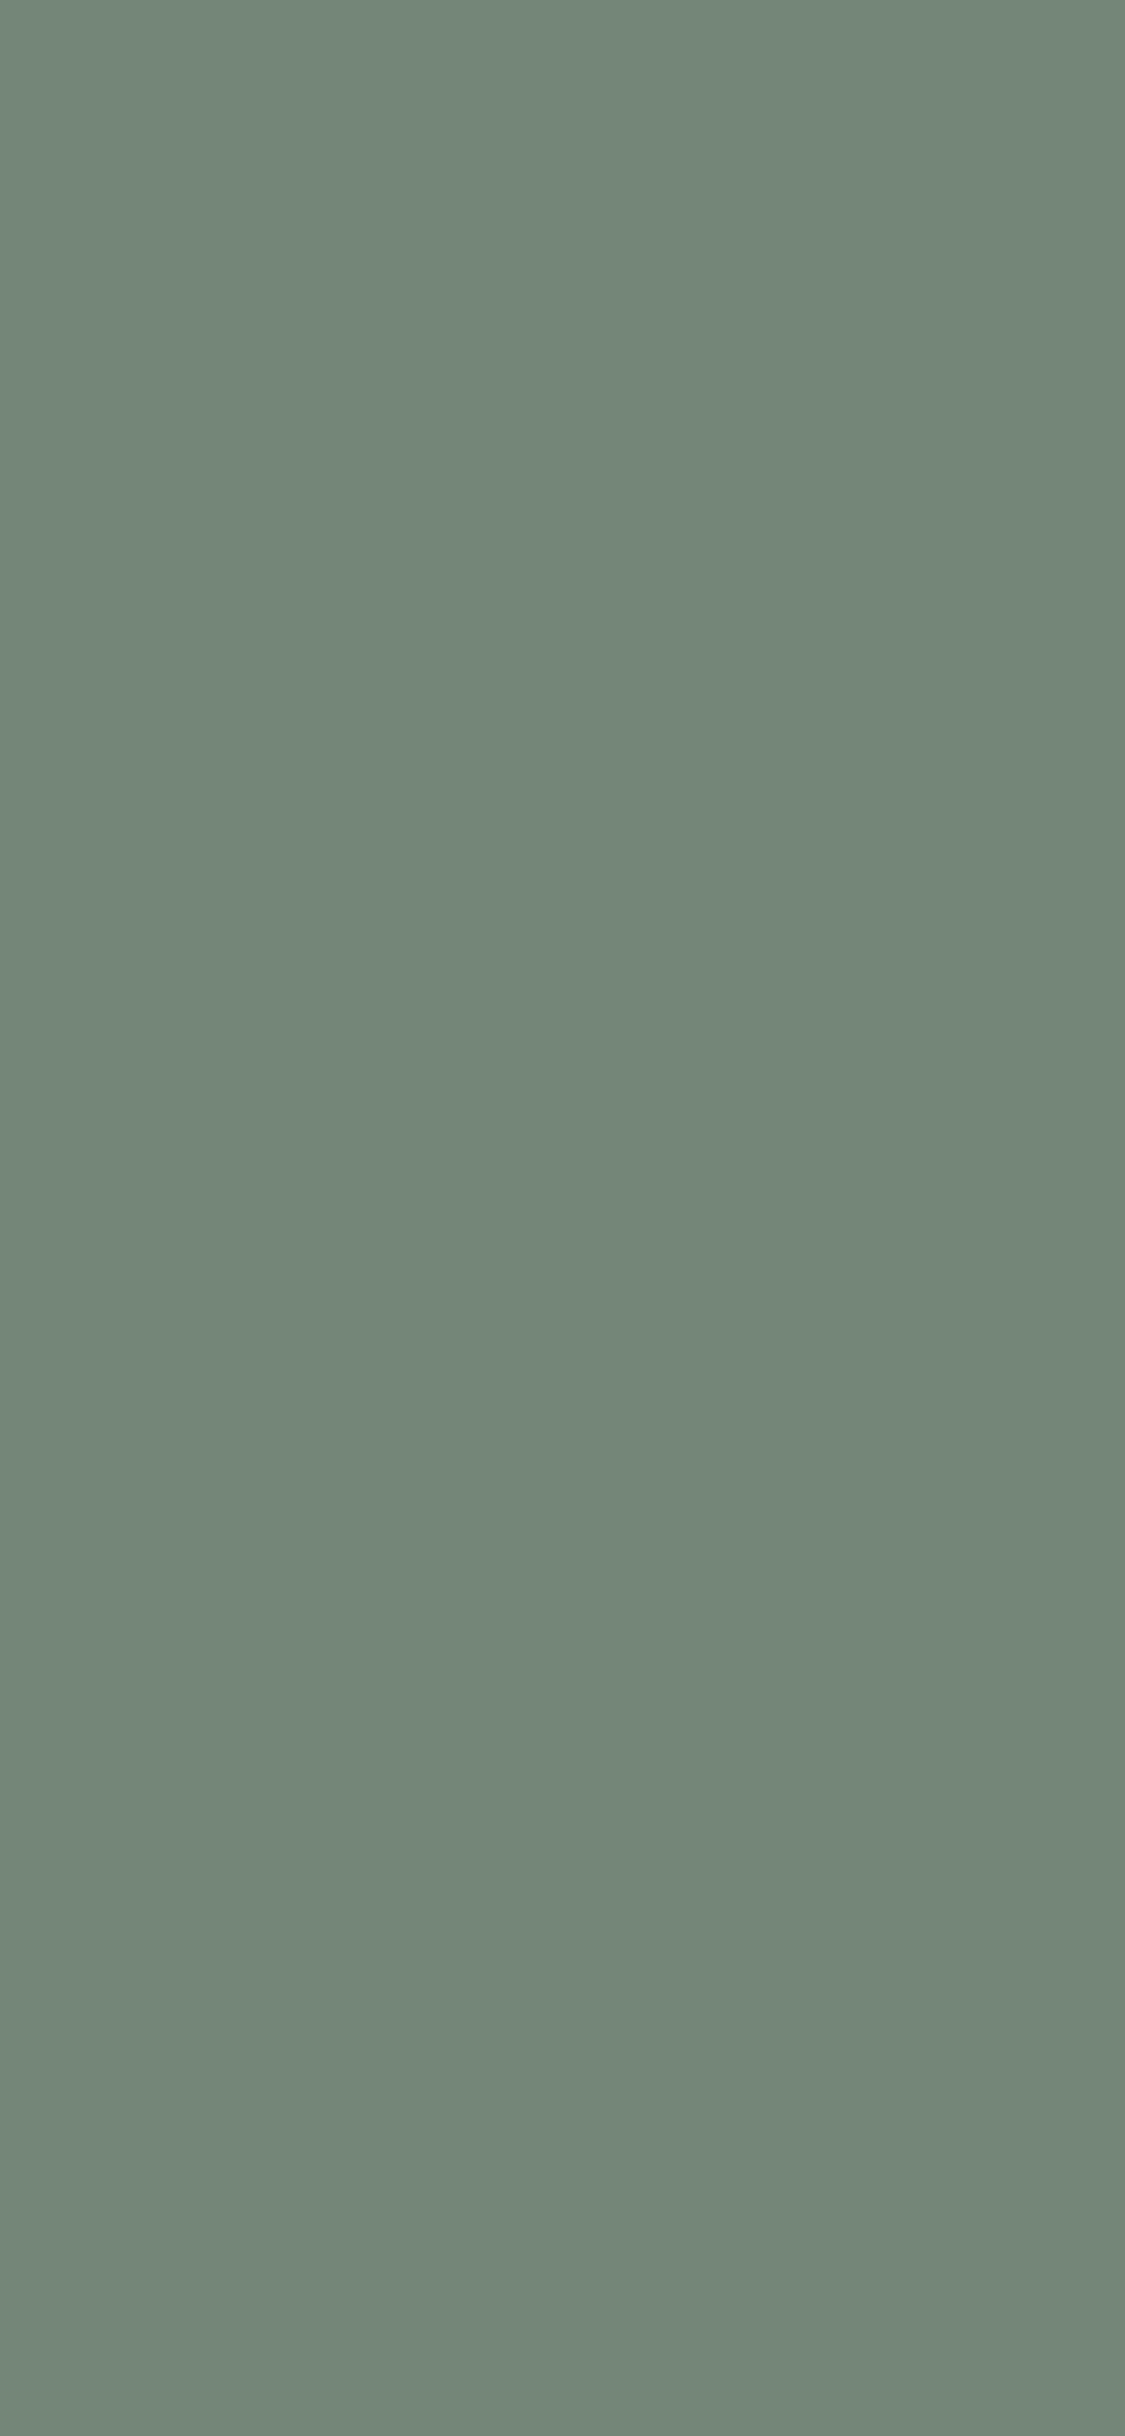 1125x2436 Xanadu Solid Color Background